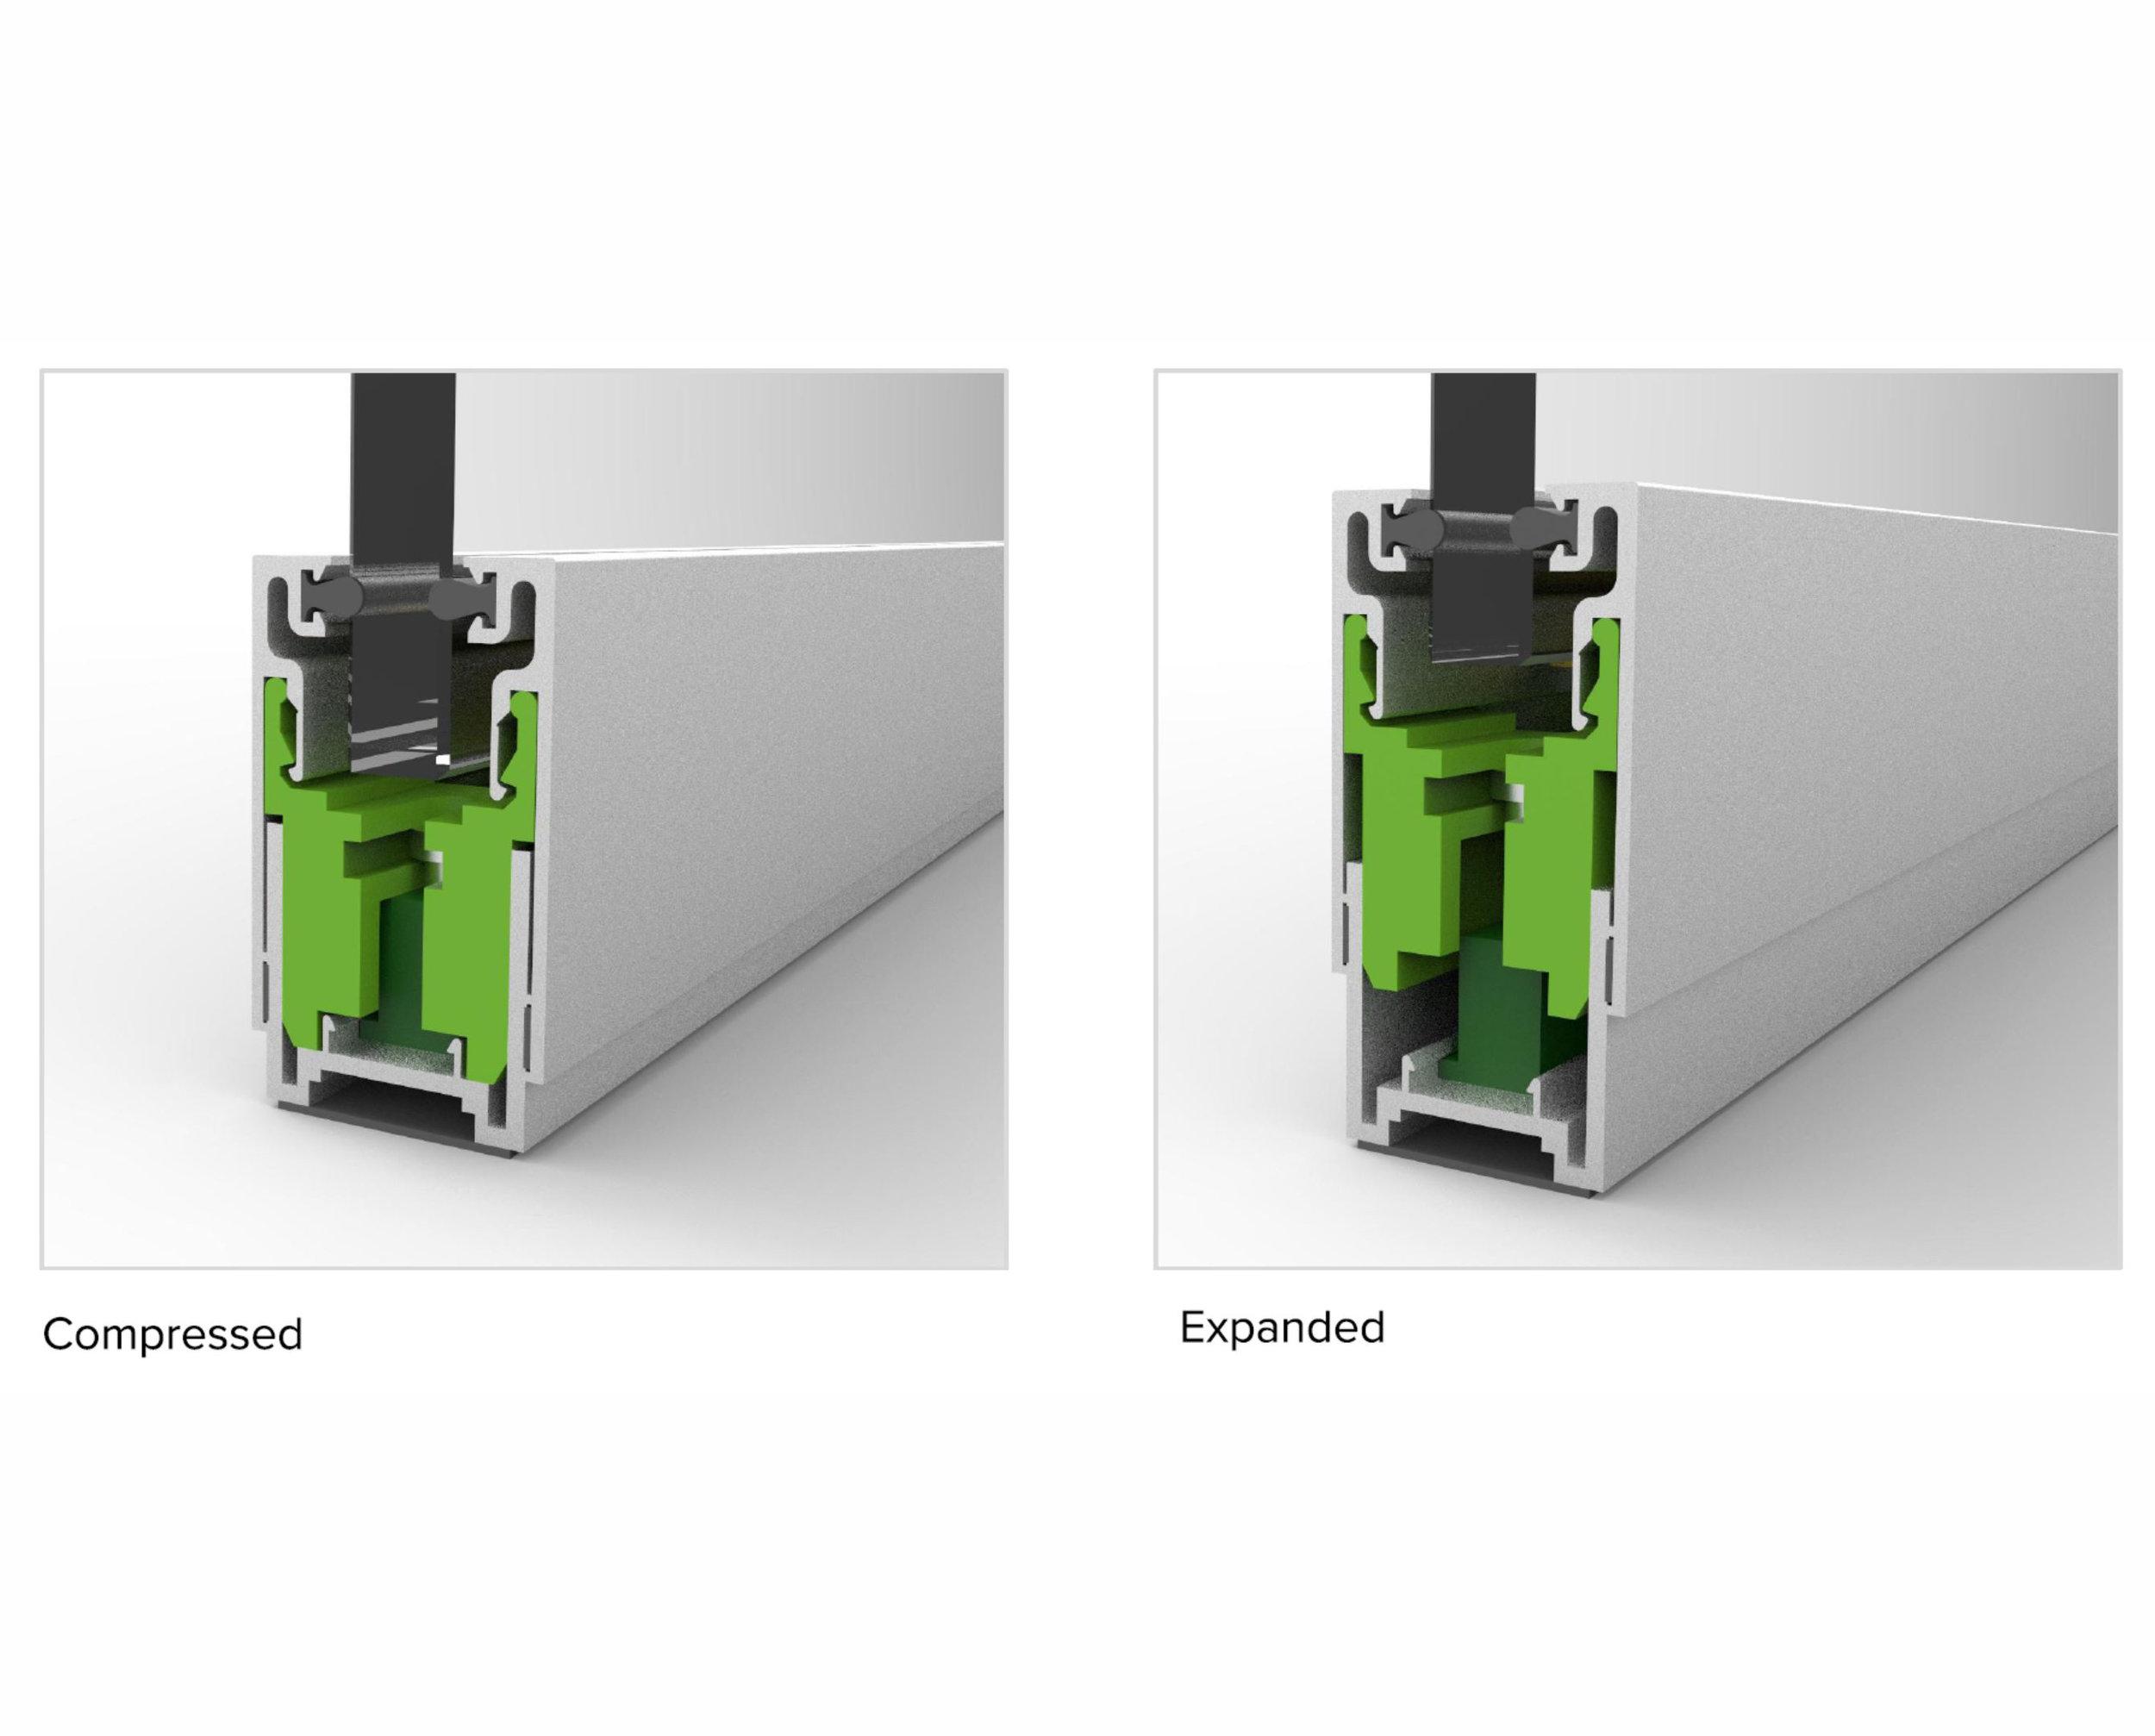 Adjustable base frame to accommodate floor discrepancies.